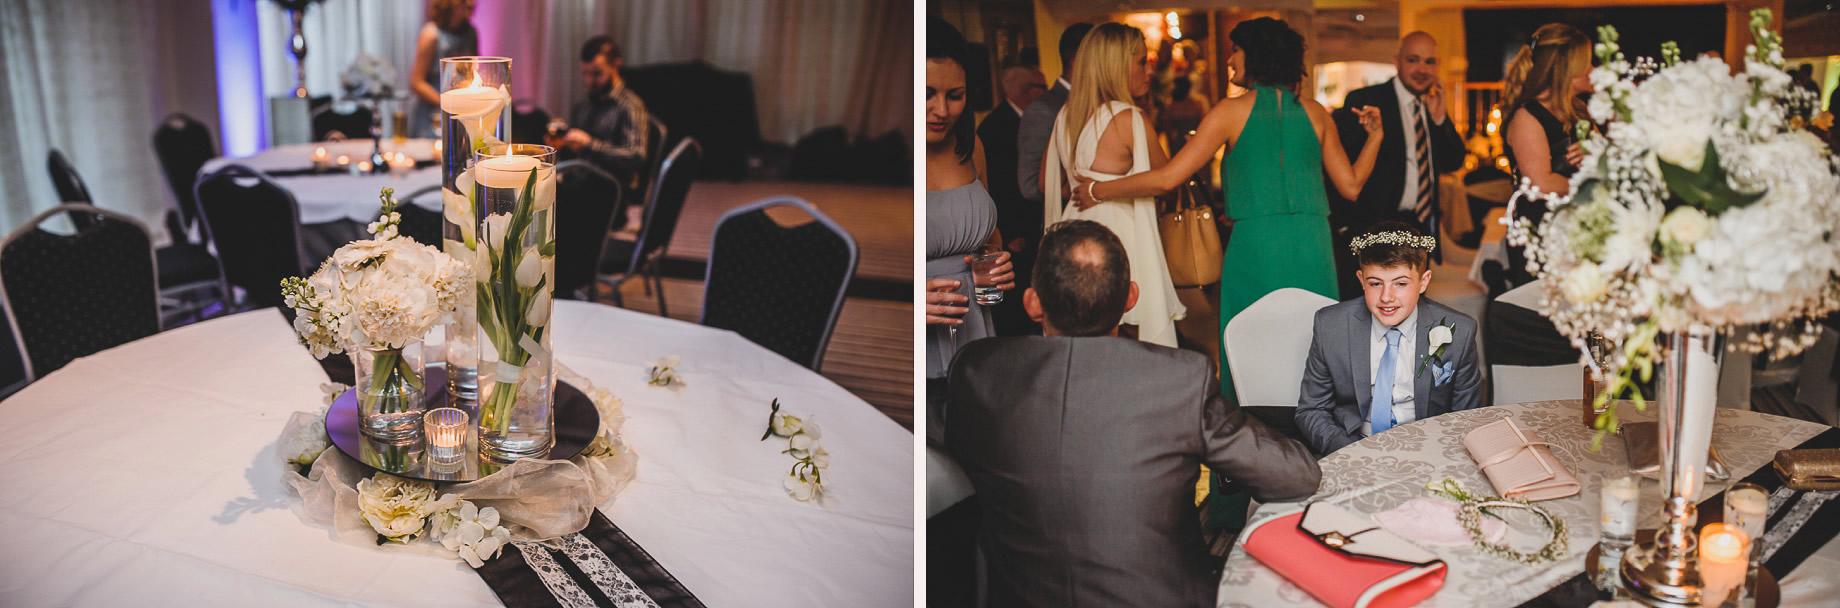 Rachel and Christian's Wedding at Holland Hall Hotel 163